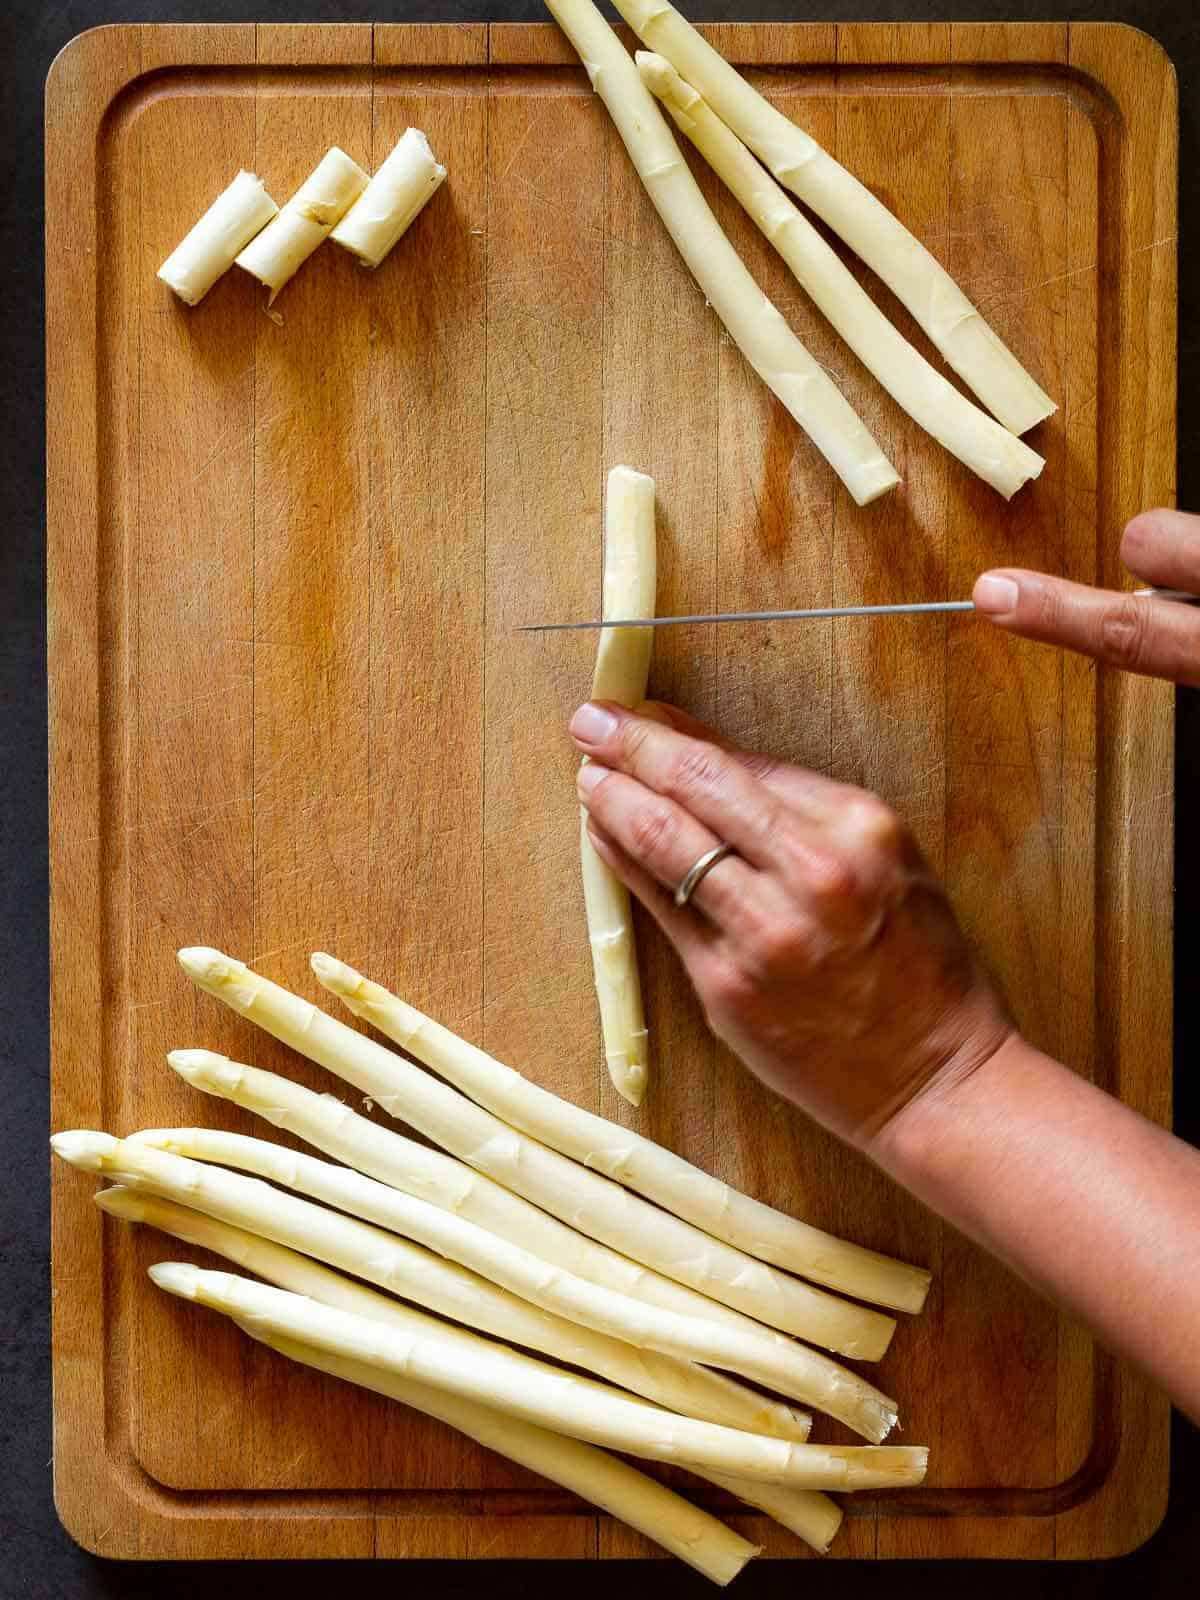 chop Asparagus ends